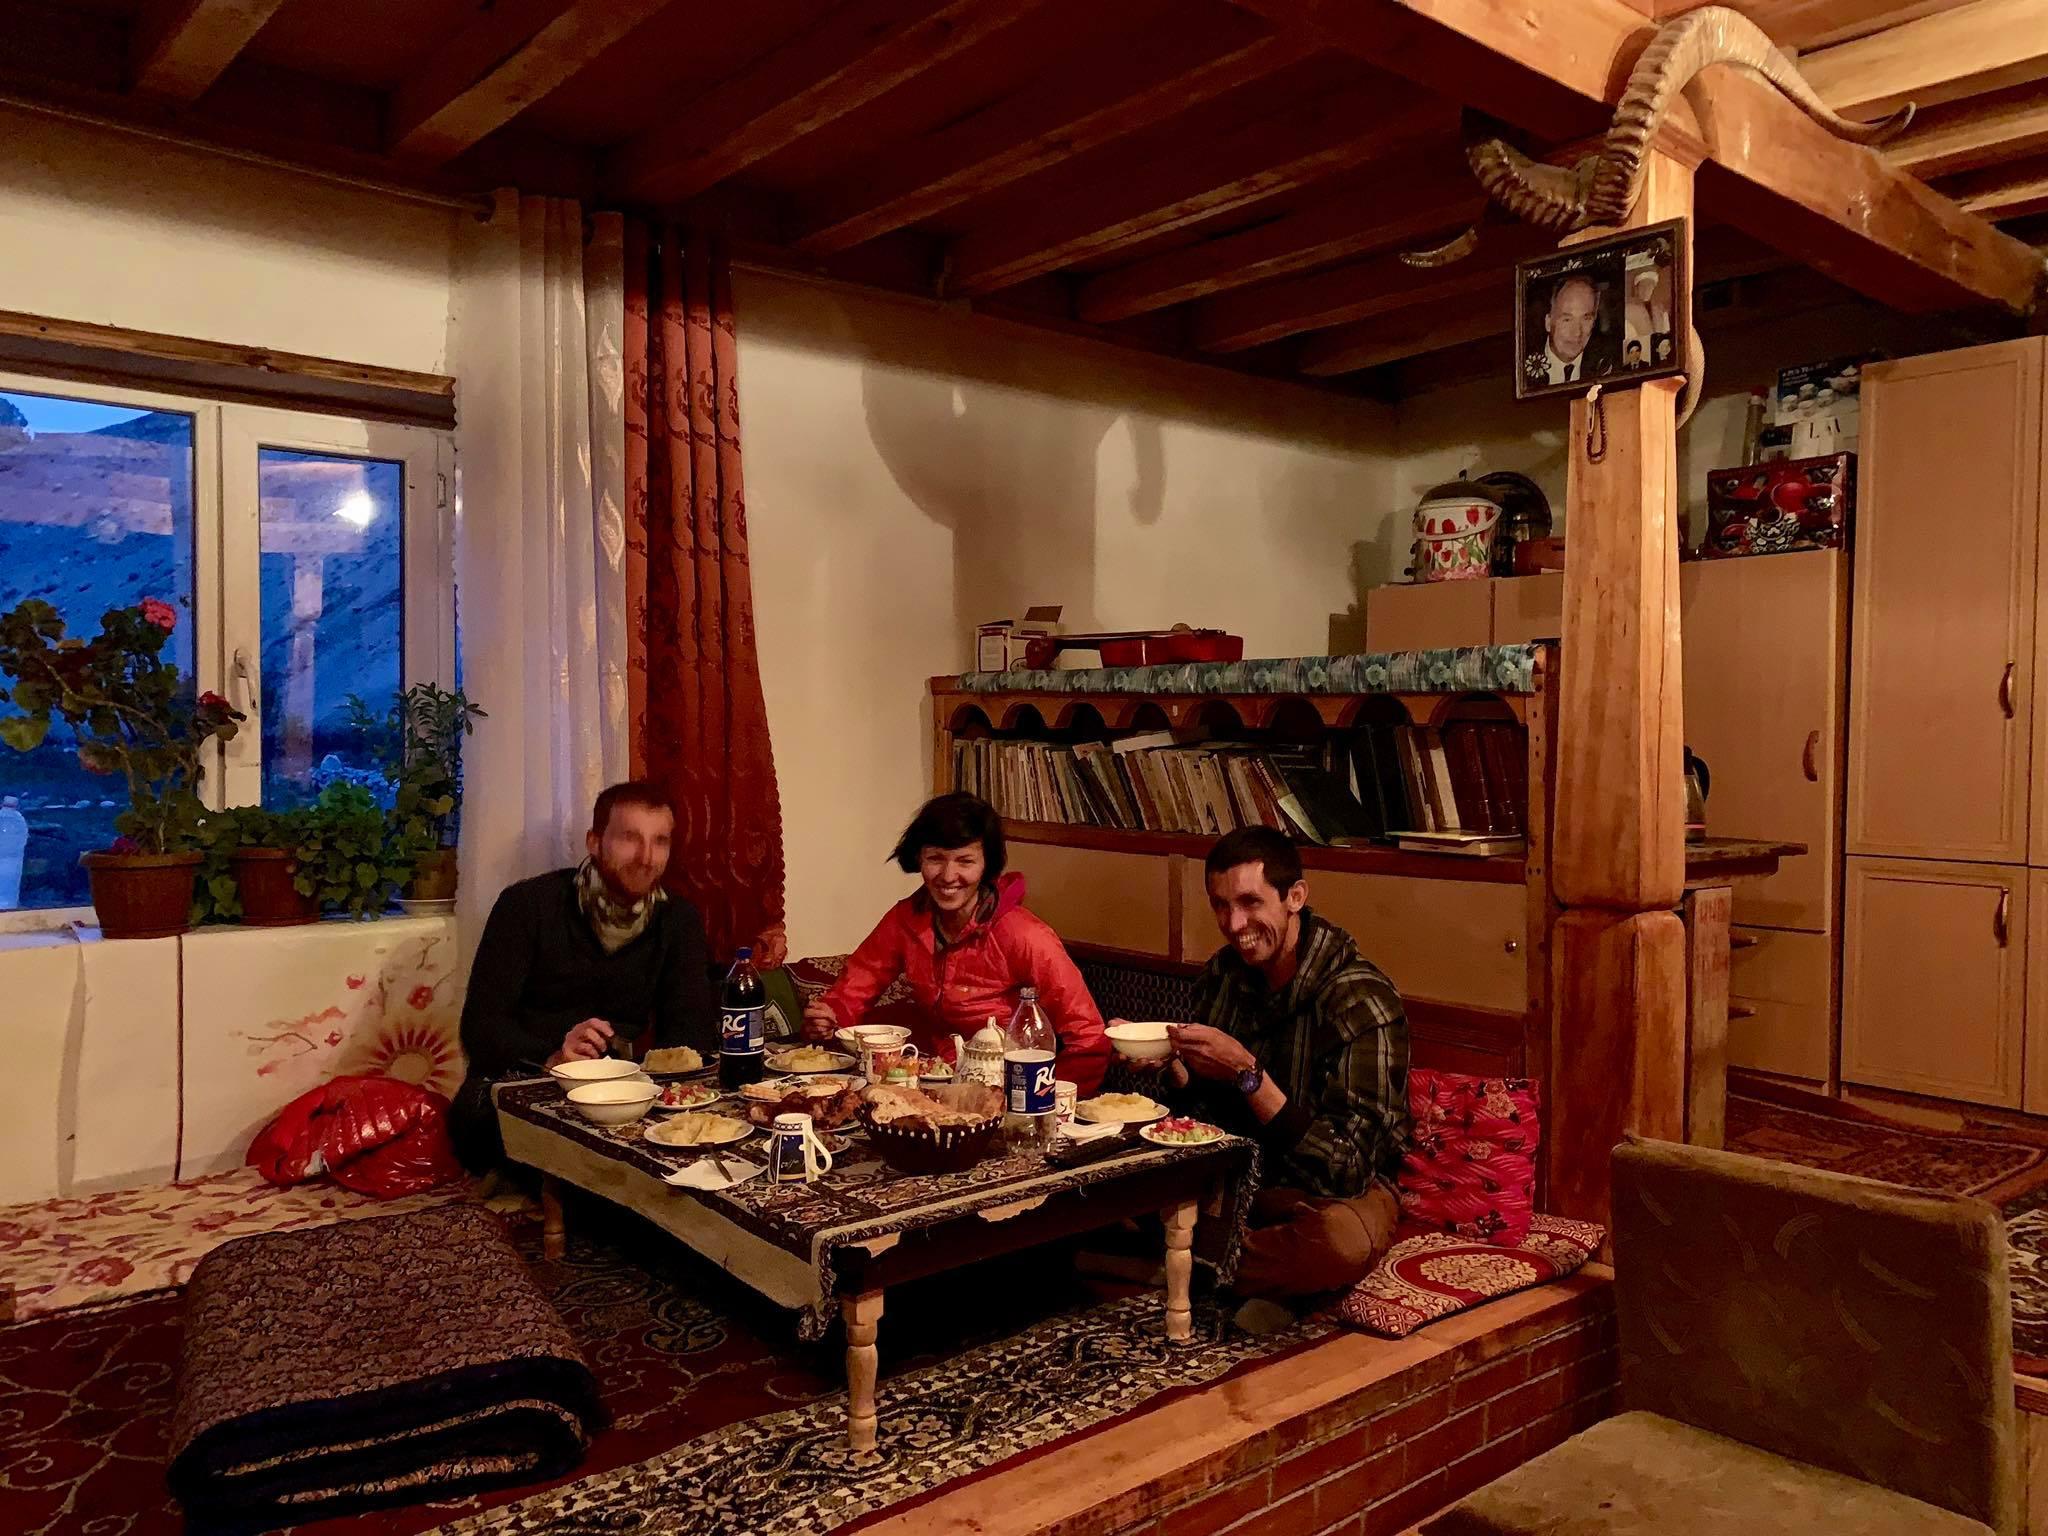 Kach Solo Travels in 2019 Experiencing a Traditional Wakhan Wedding in Tajikistan18.jpg